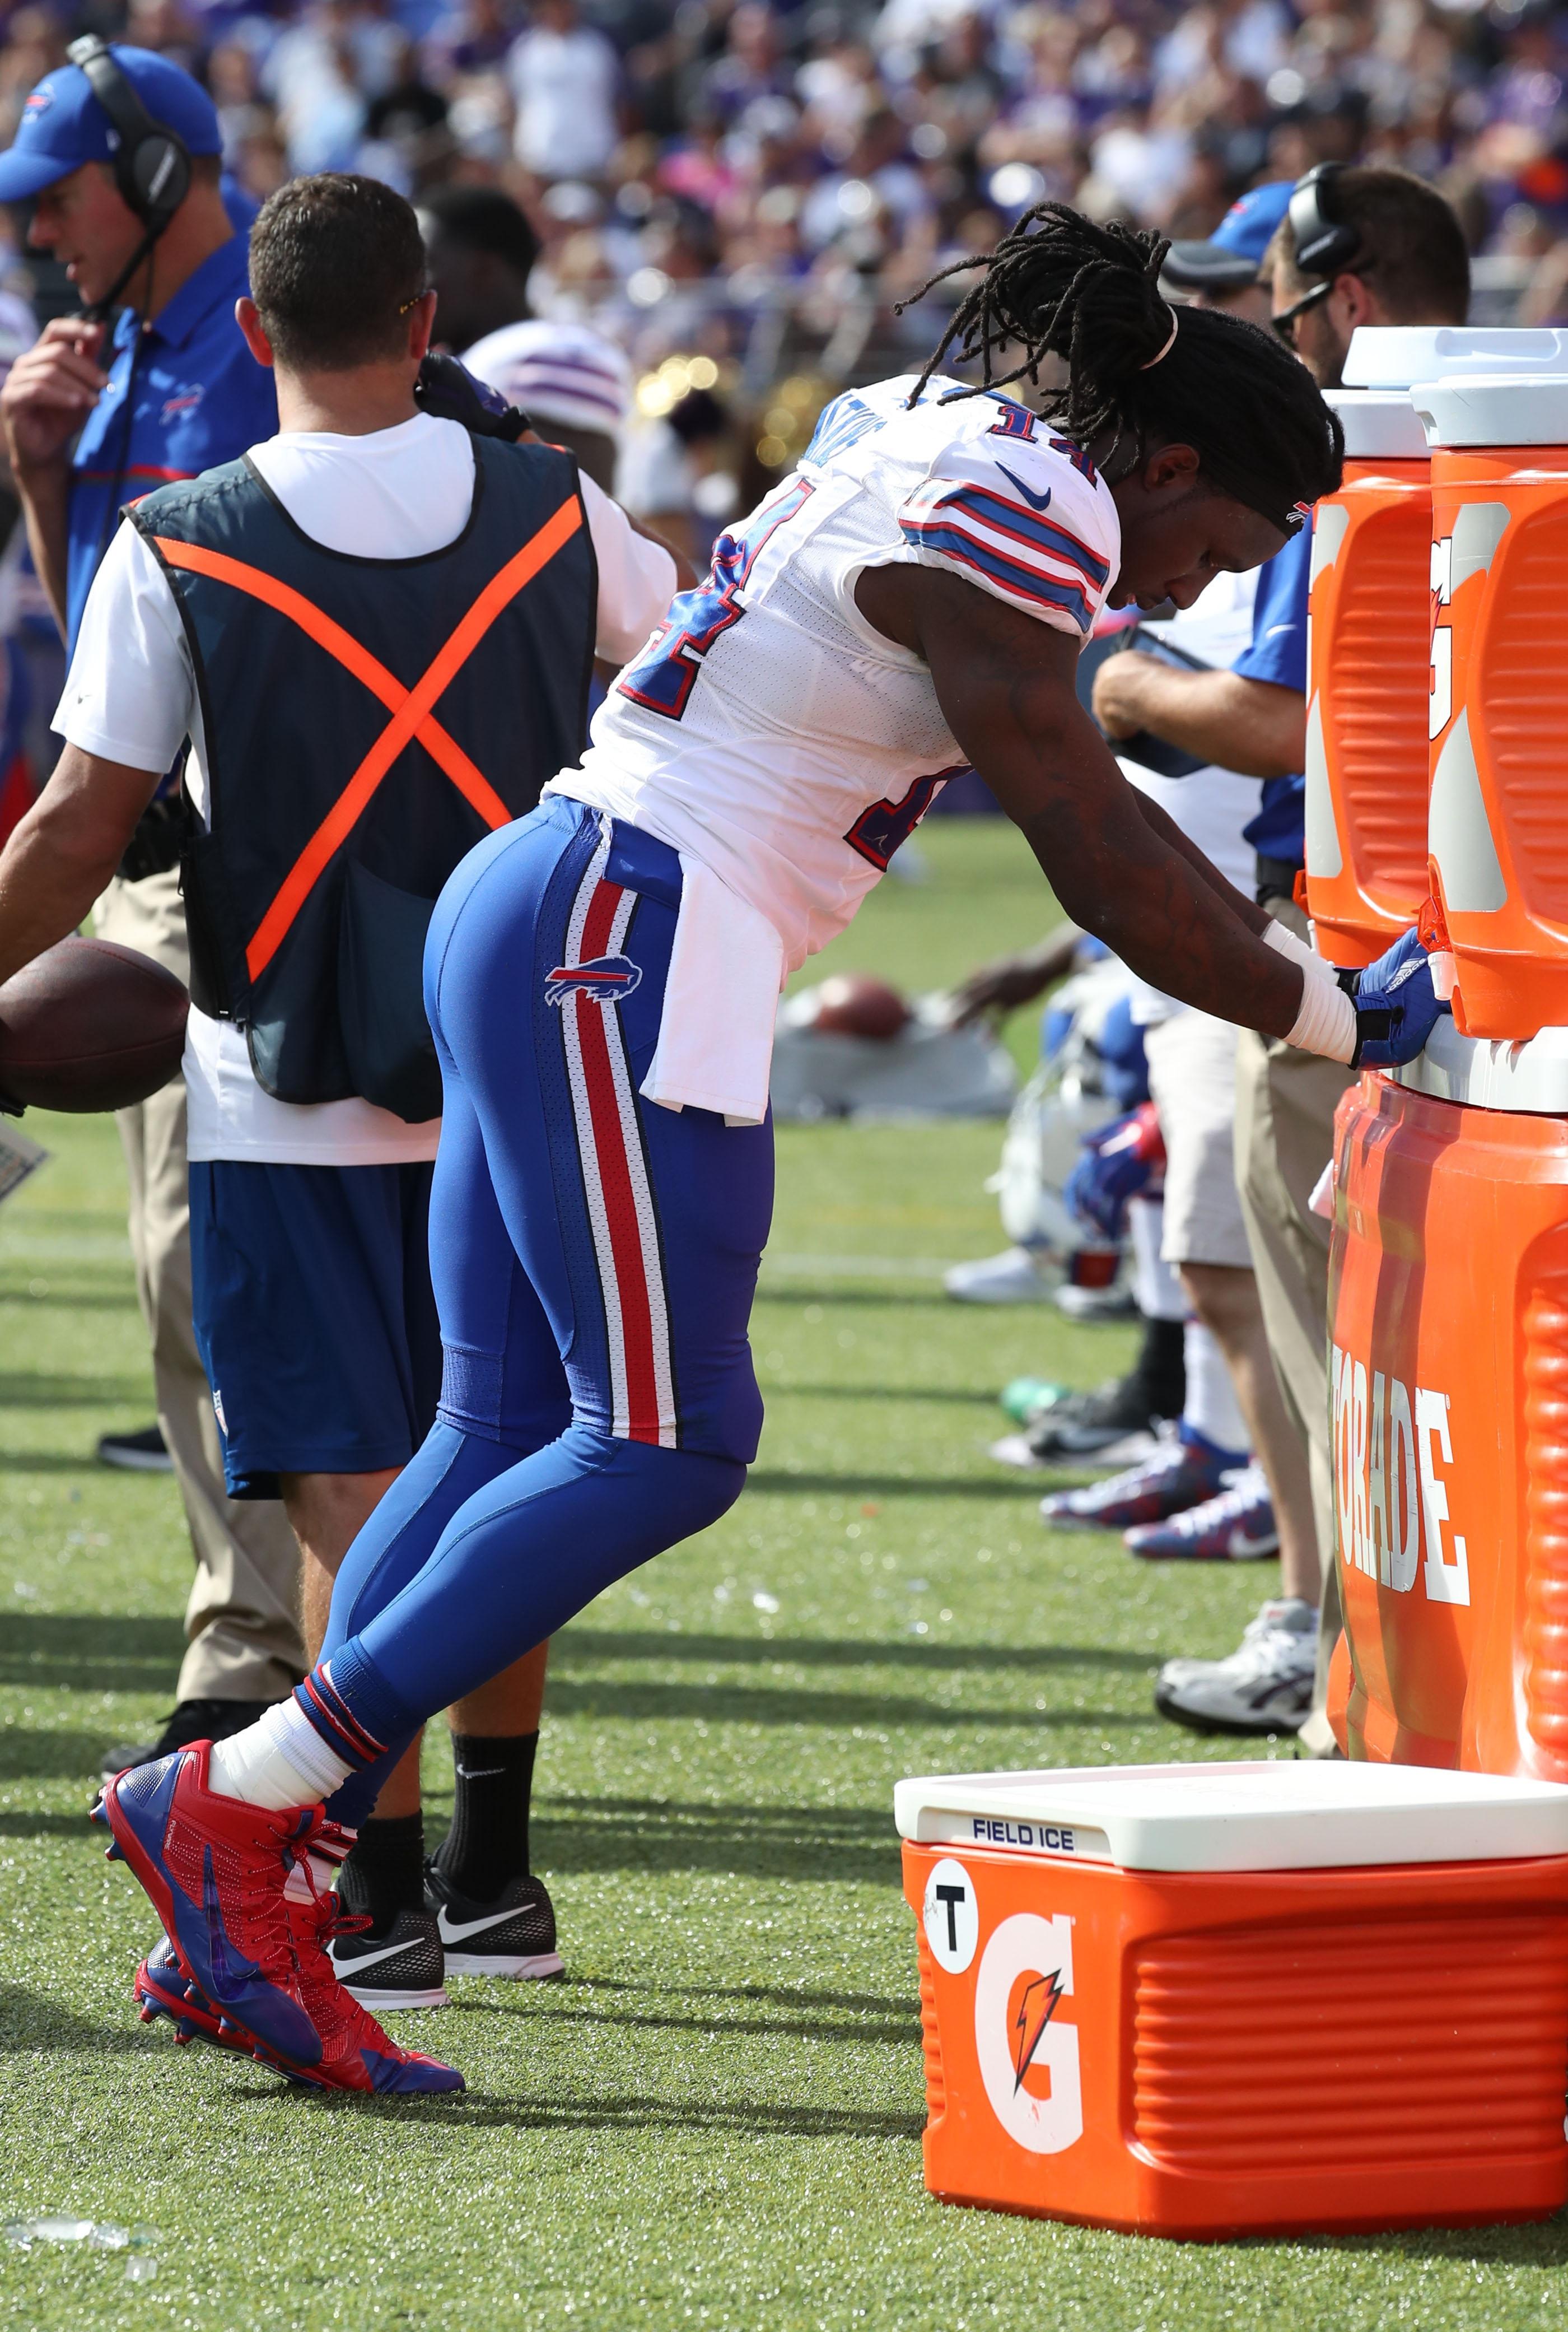 Buffalo Bills wide receiver Sammy Watkins. (James P. McCoy/Buffalo News)